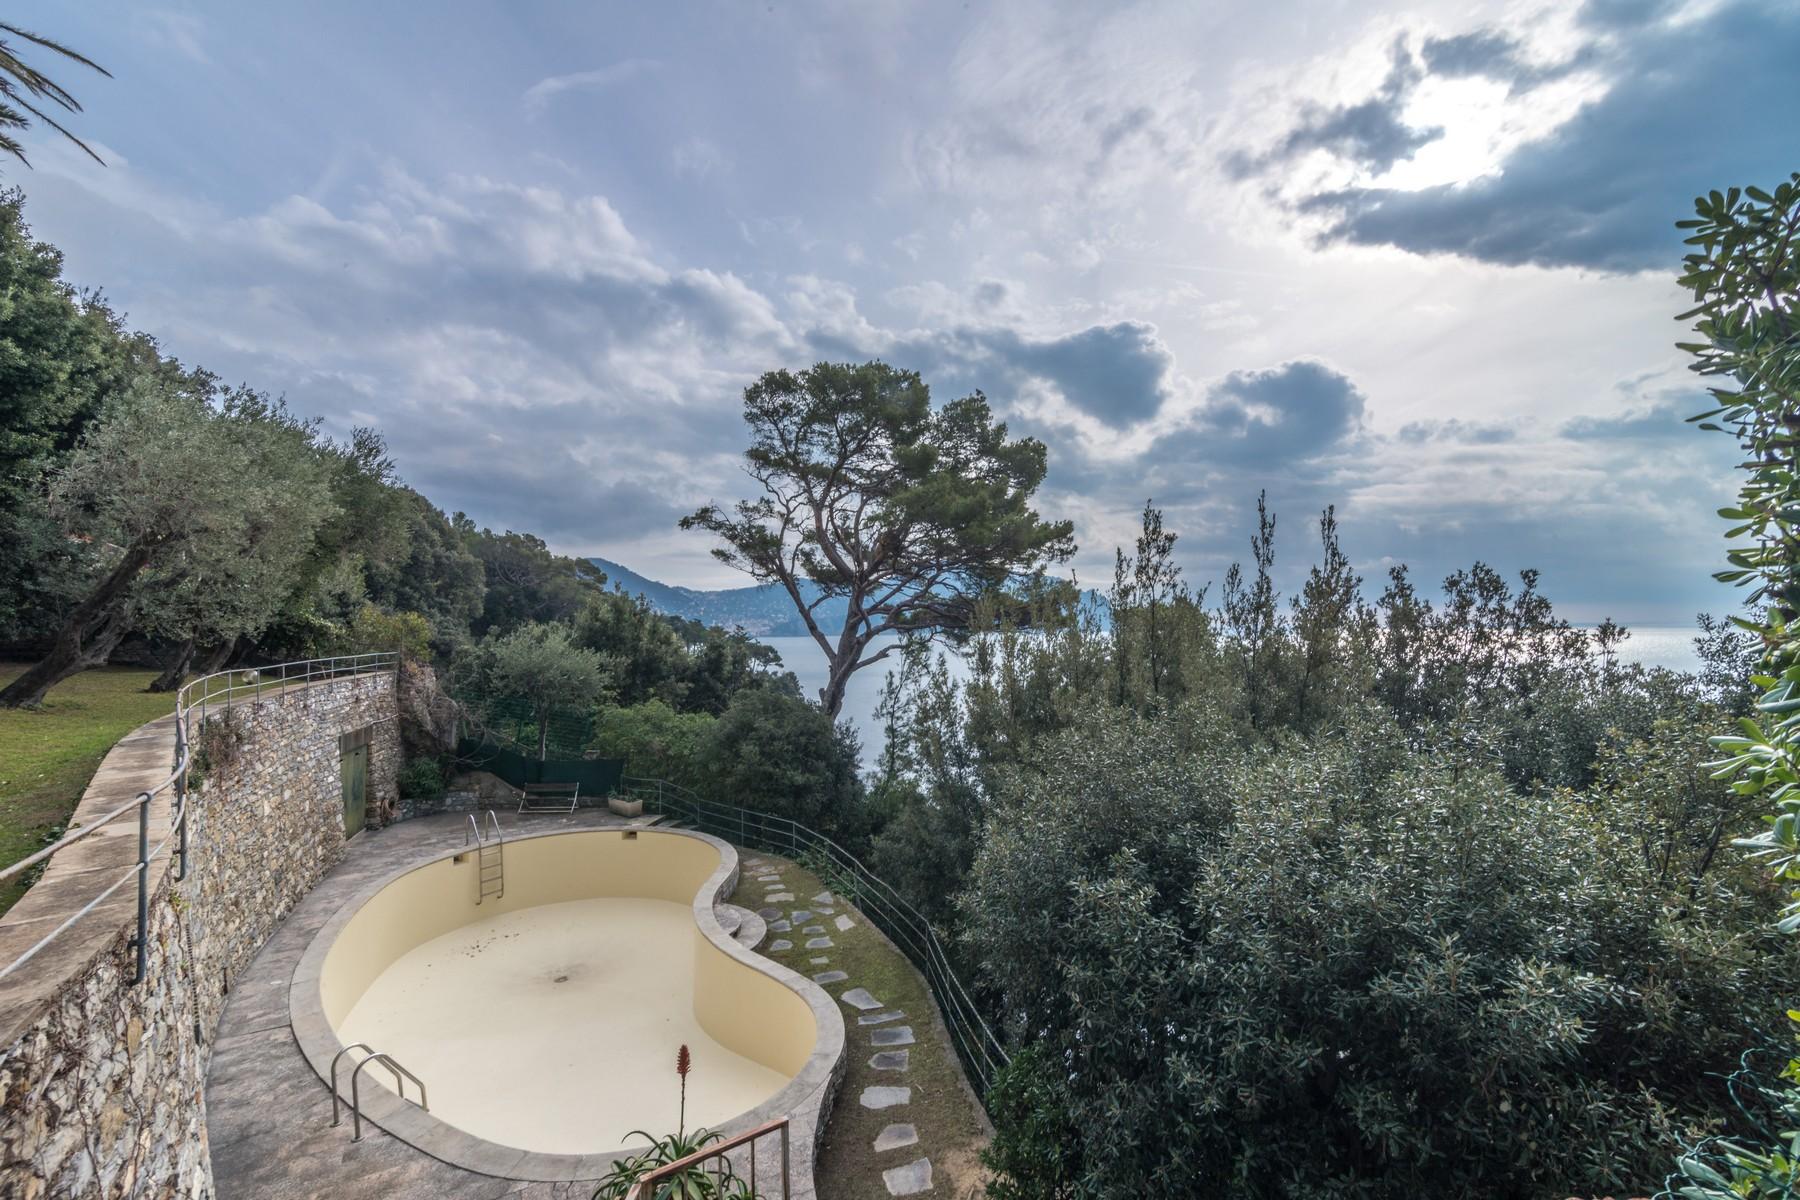 Villa in Vendita a Sori: 5 locali, 720 mq - Foto 5